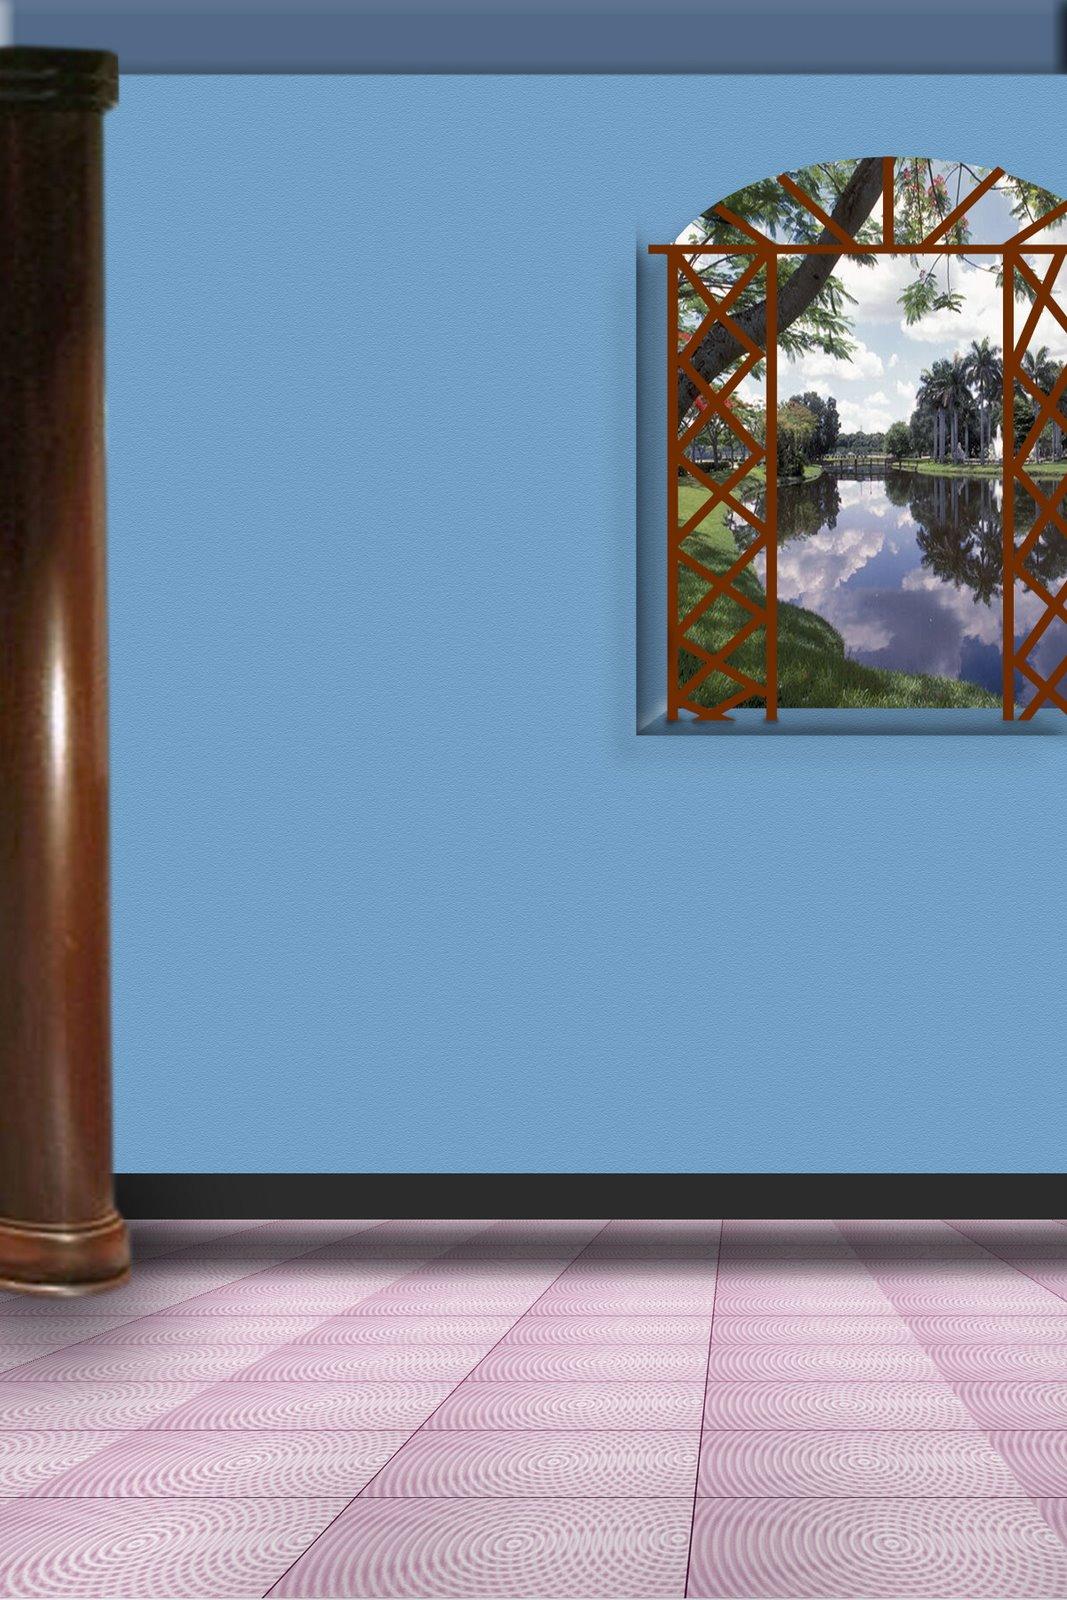 11 Studio Background Psd Photoshop Image File Download Images